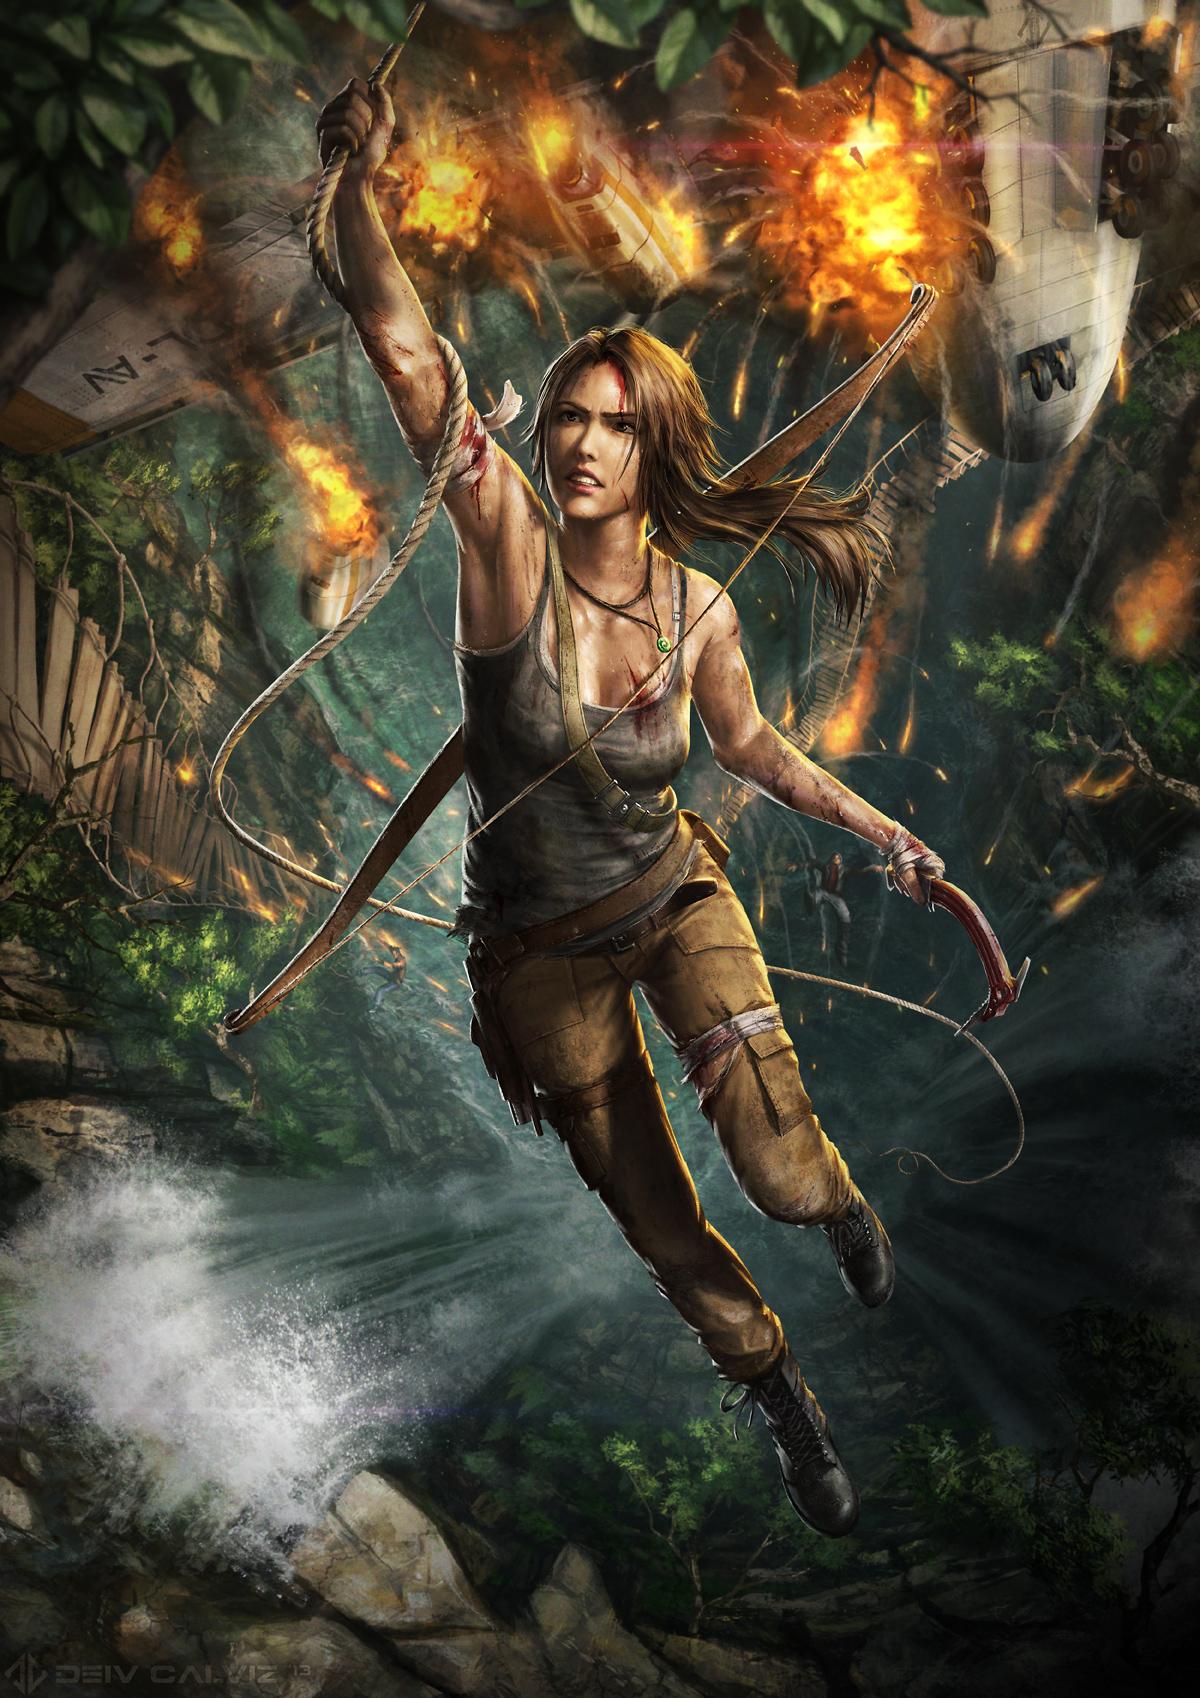 Lara Croft Concept Art by Viktor Titov - DigitalArt.io